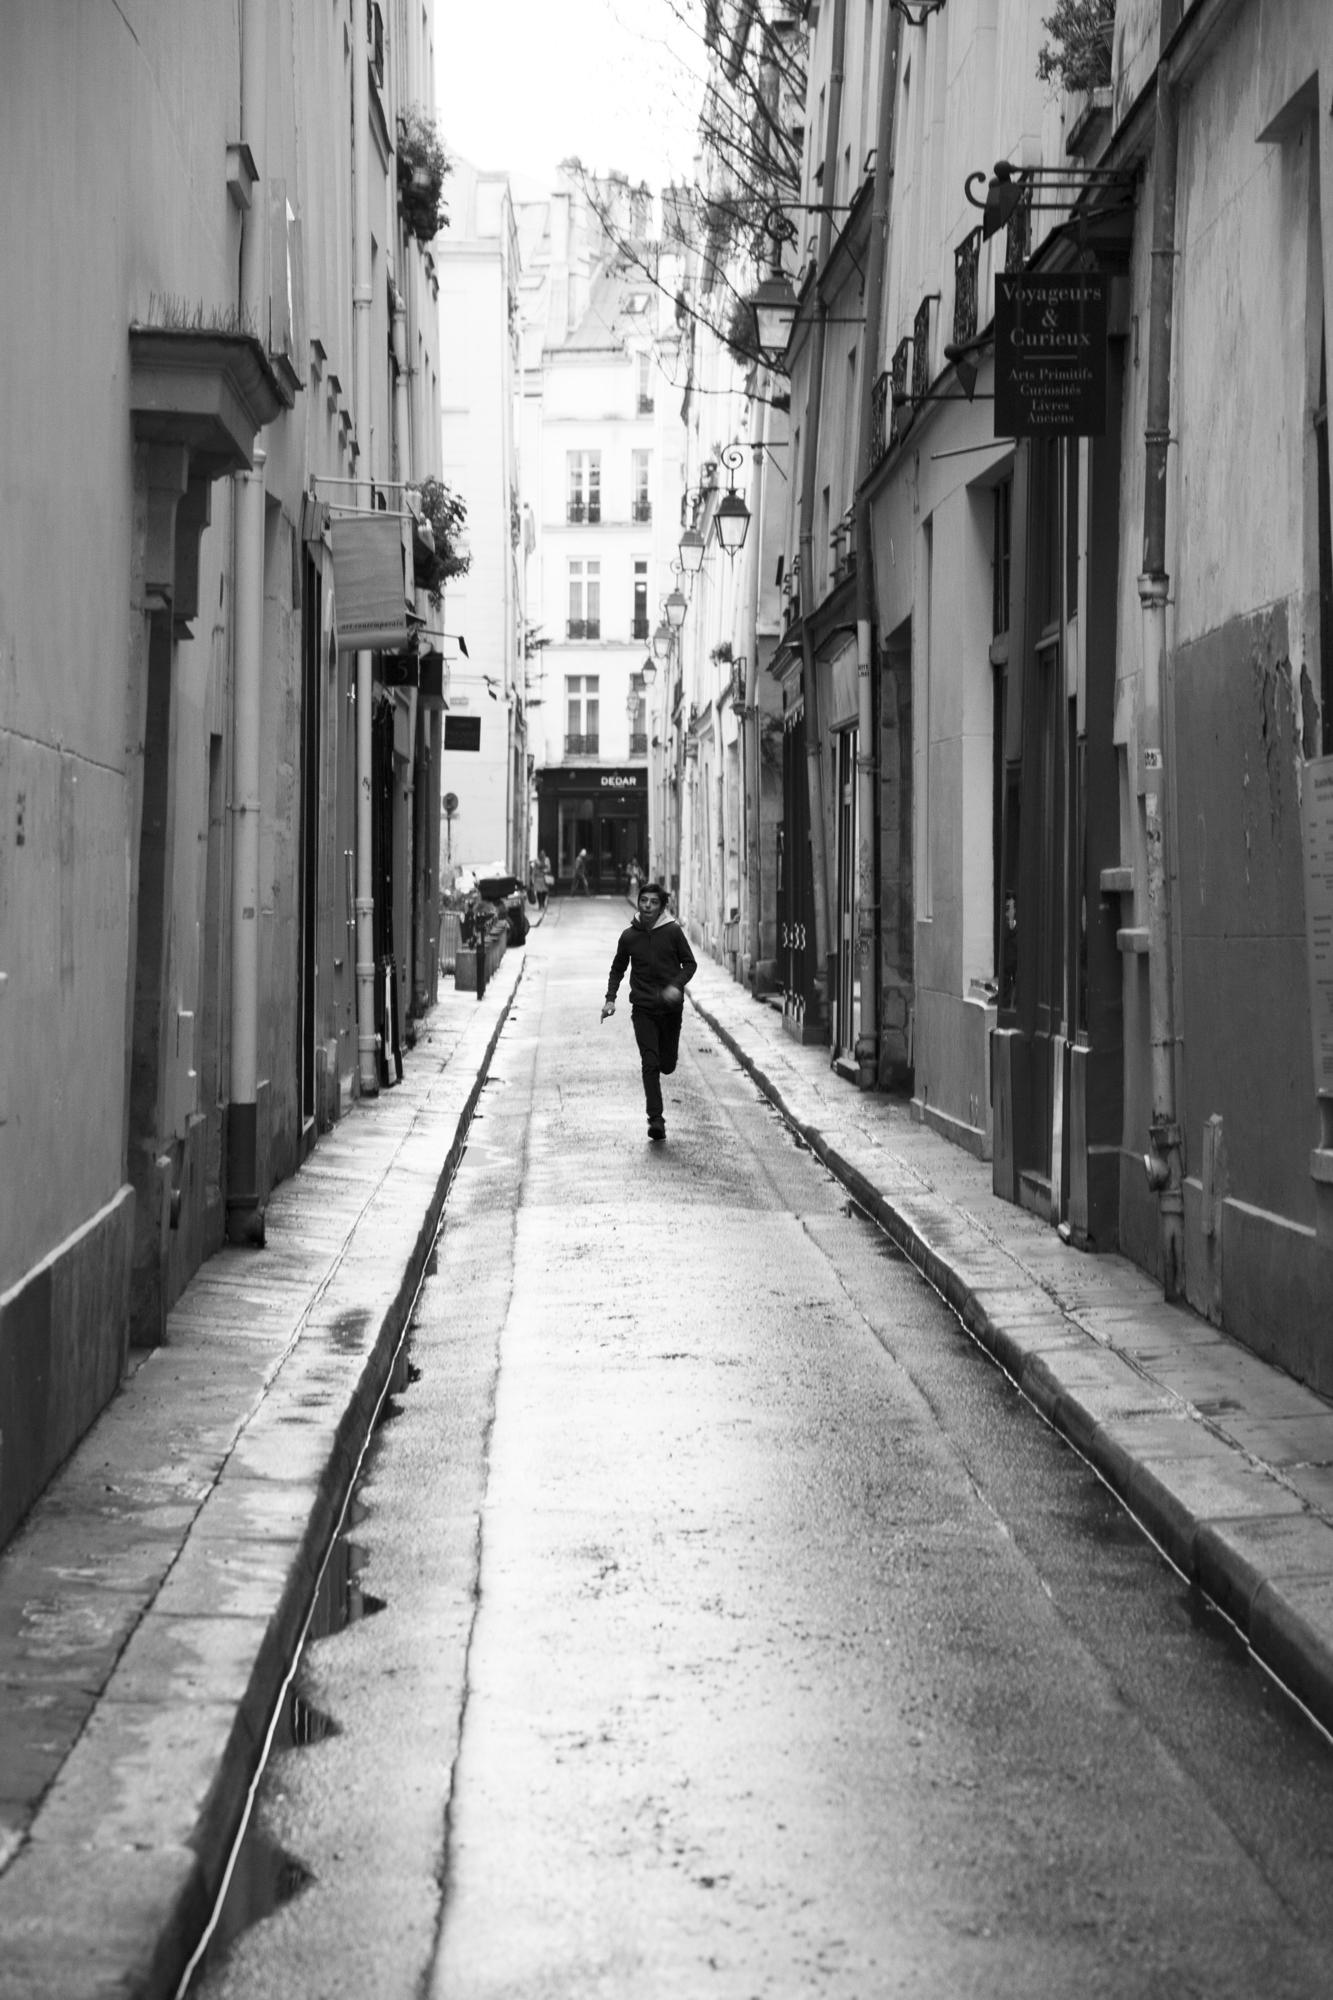 """Run and run again"" - Rue Visconti, Paris (2018). © Clémence Rougetet"